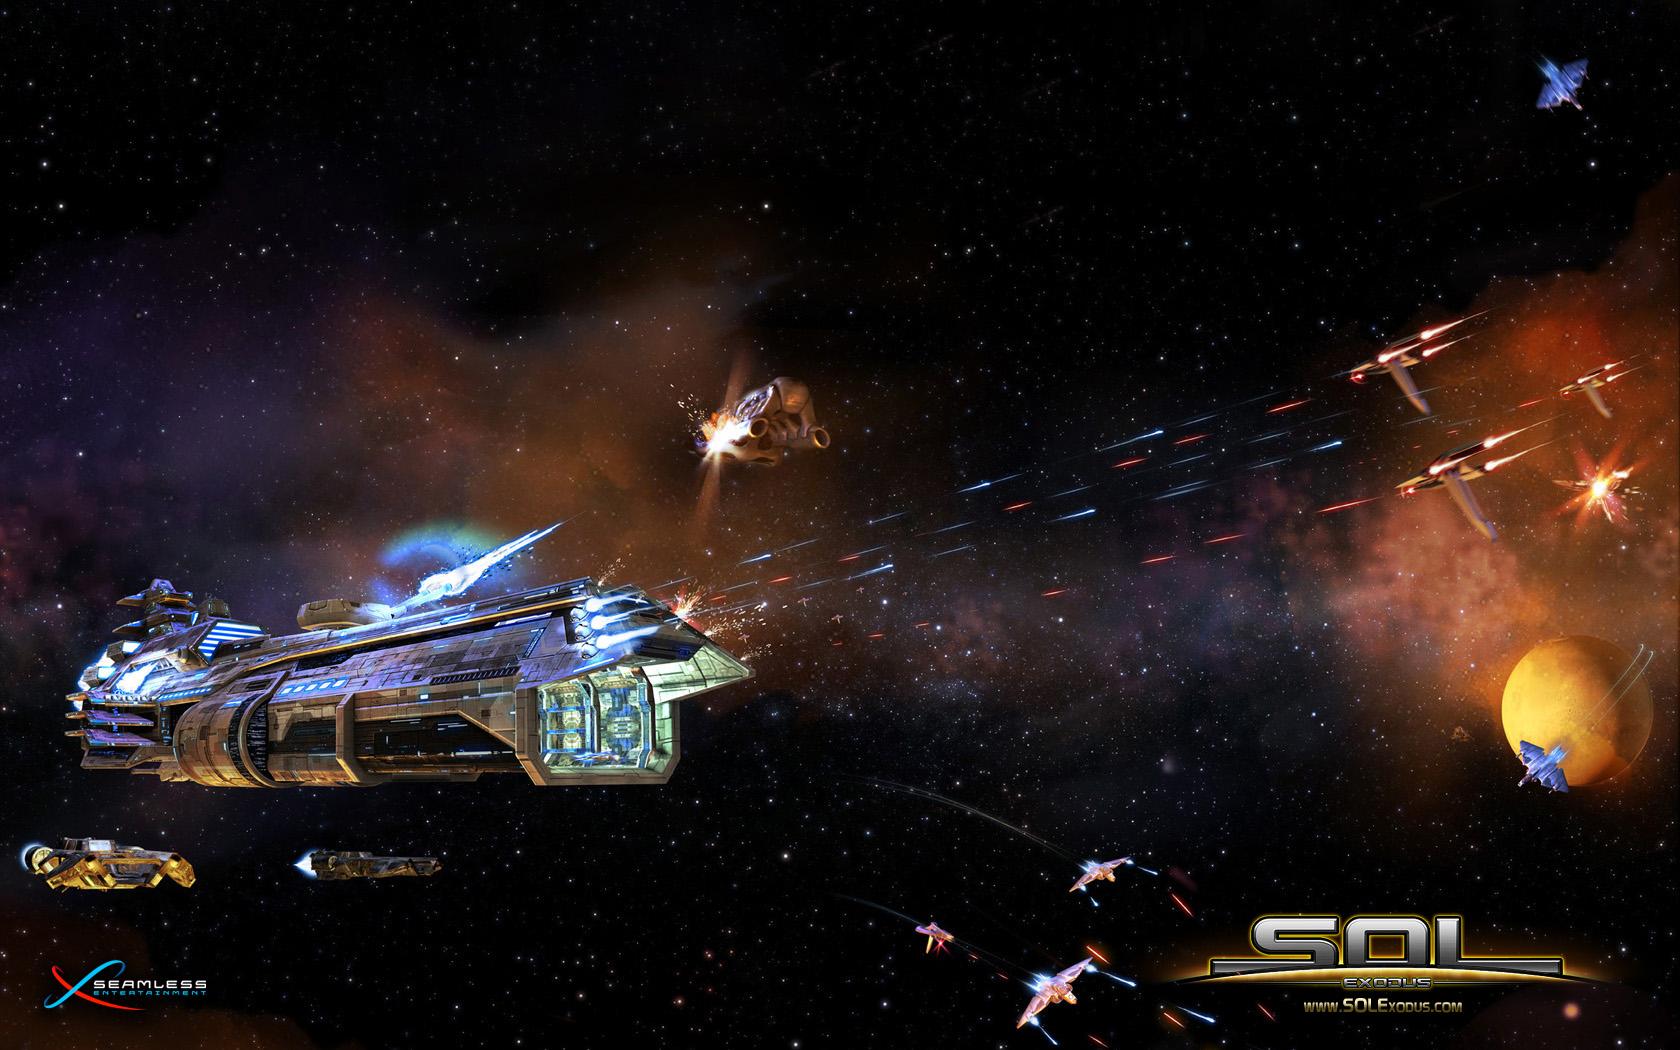 Space battle 1 1680x1050jpg 1680x1050